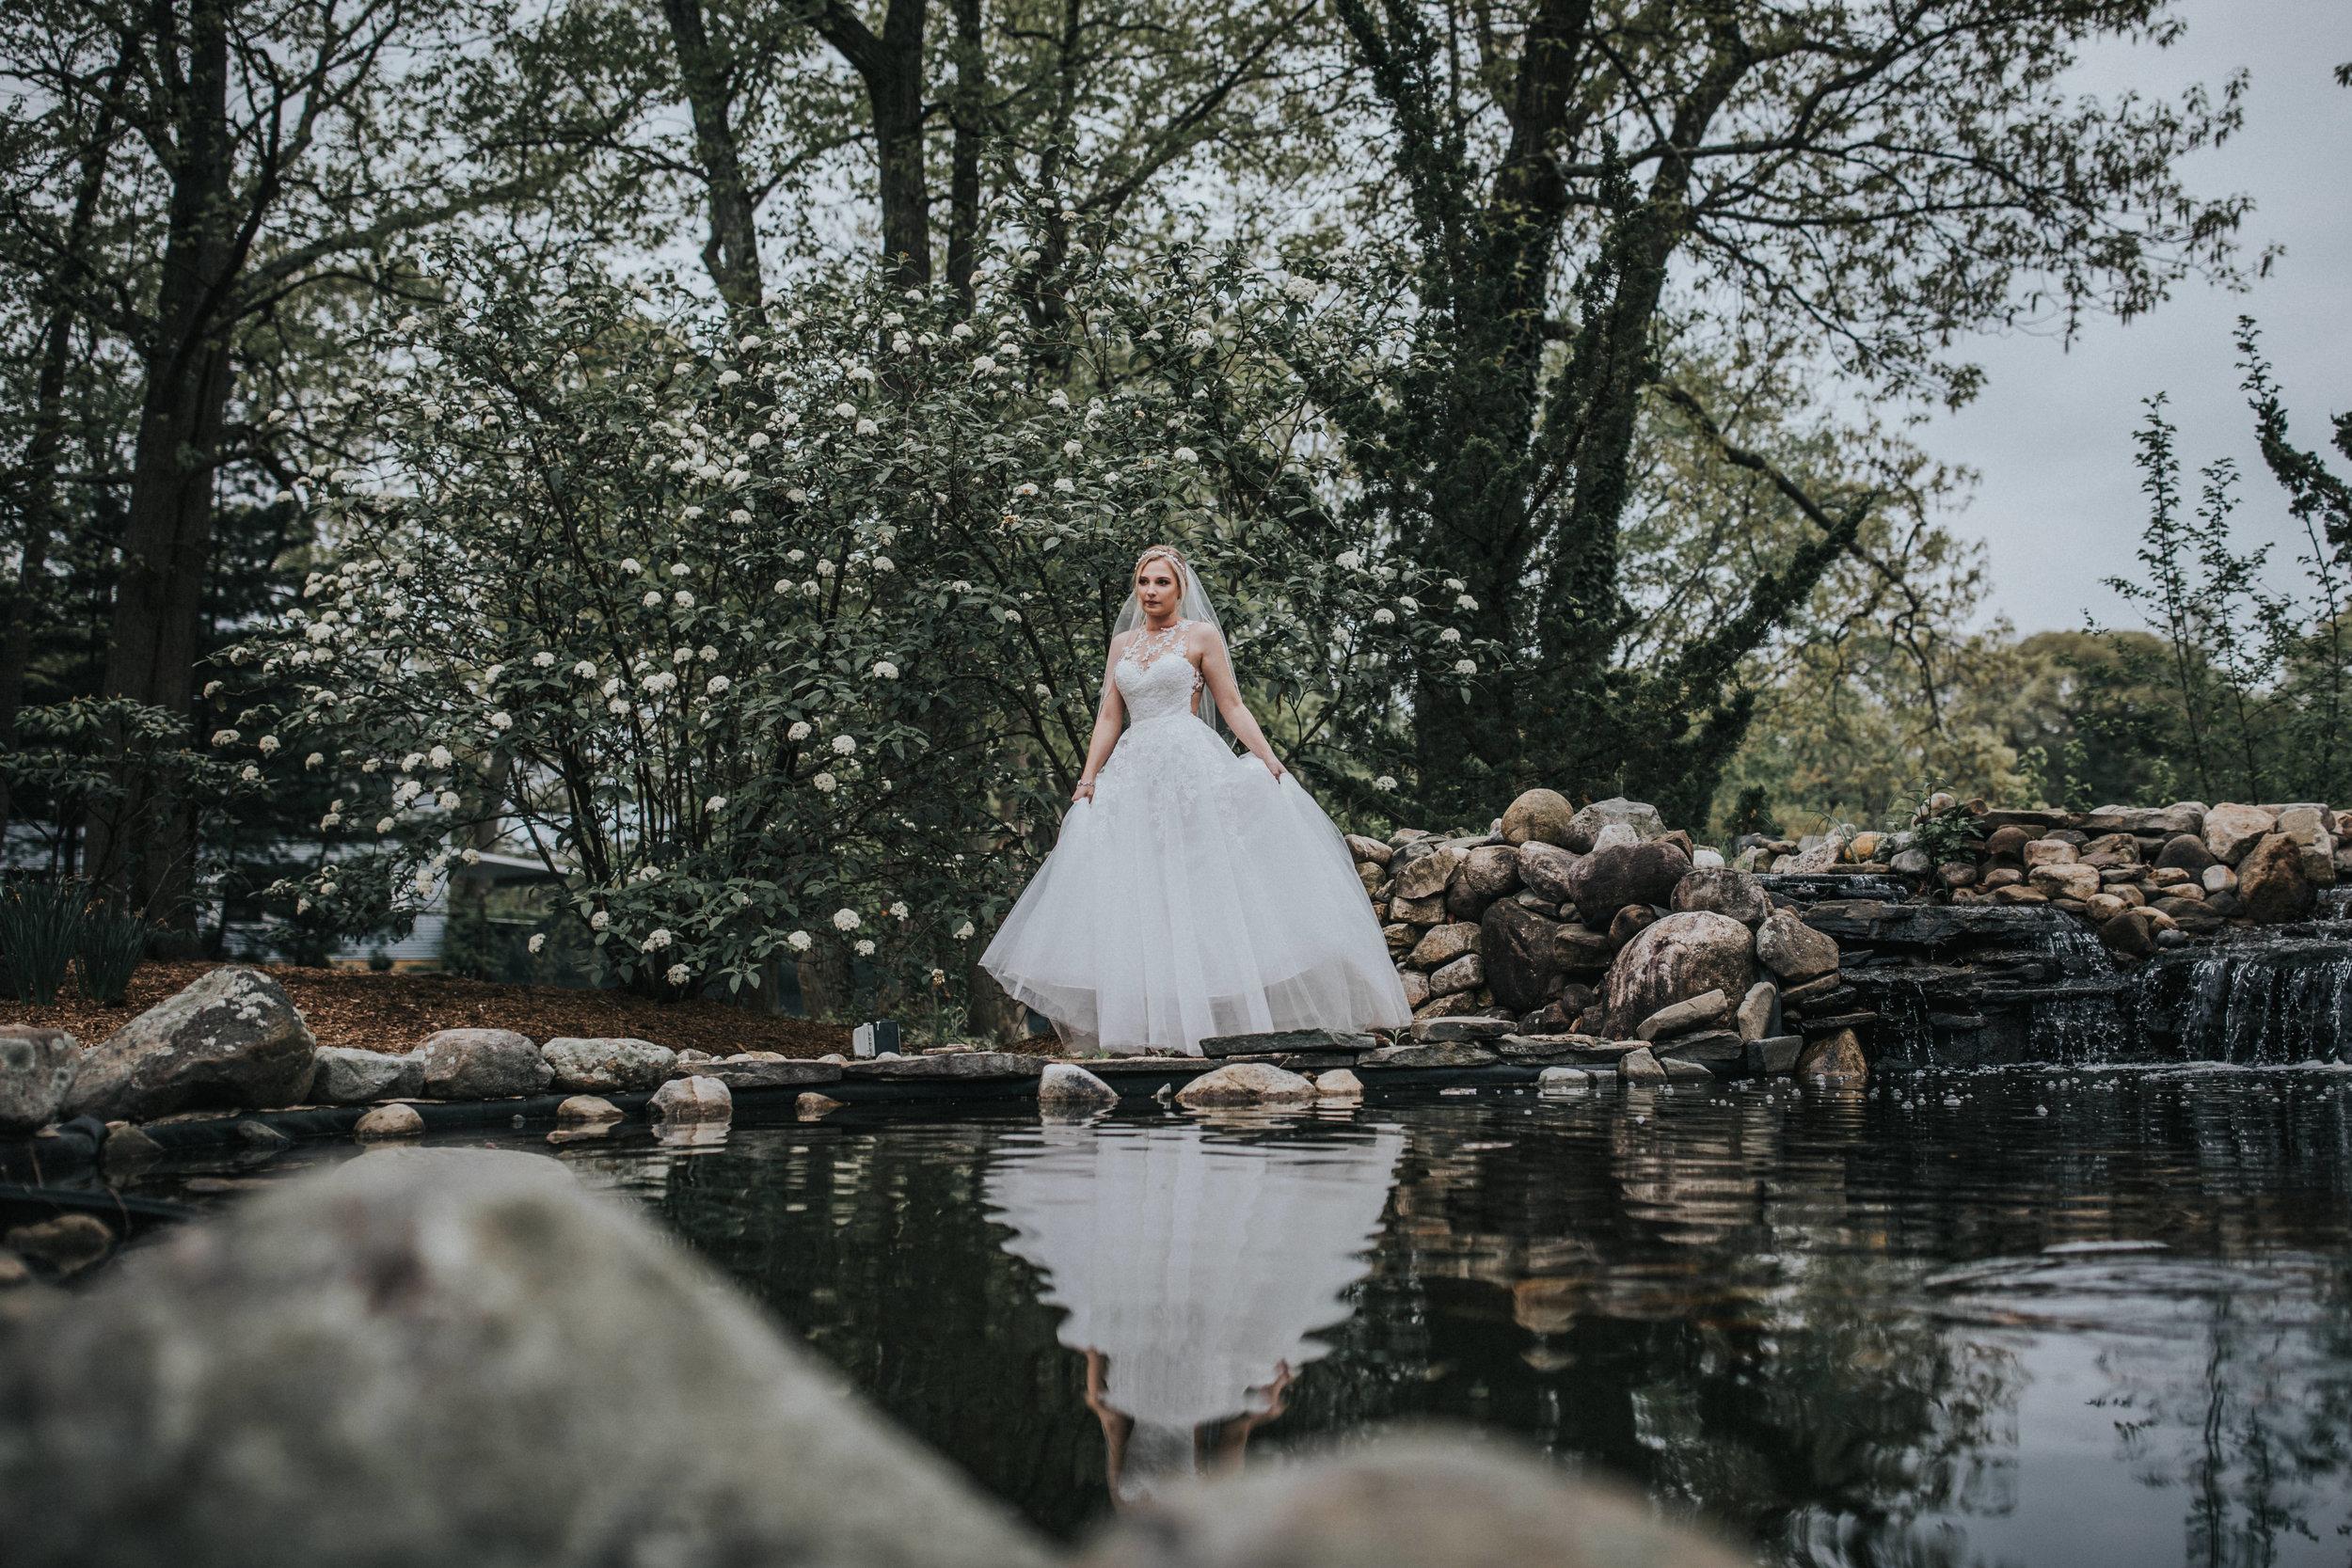 New-Jersey-Wedding-Photographer-Megan&Nick-BrideandGroom-13.jpg